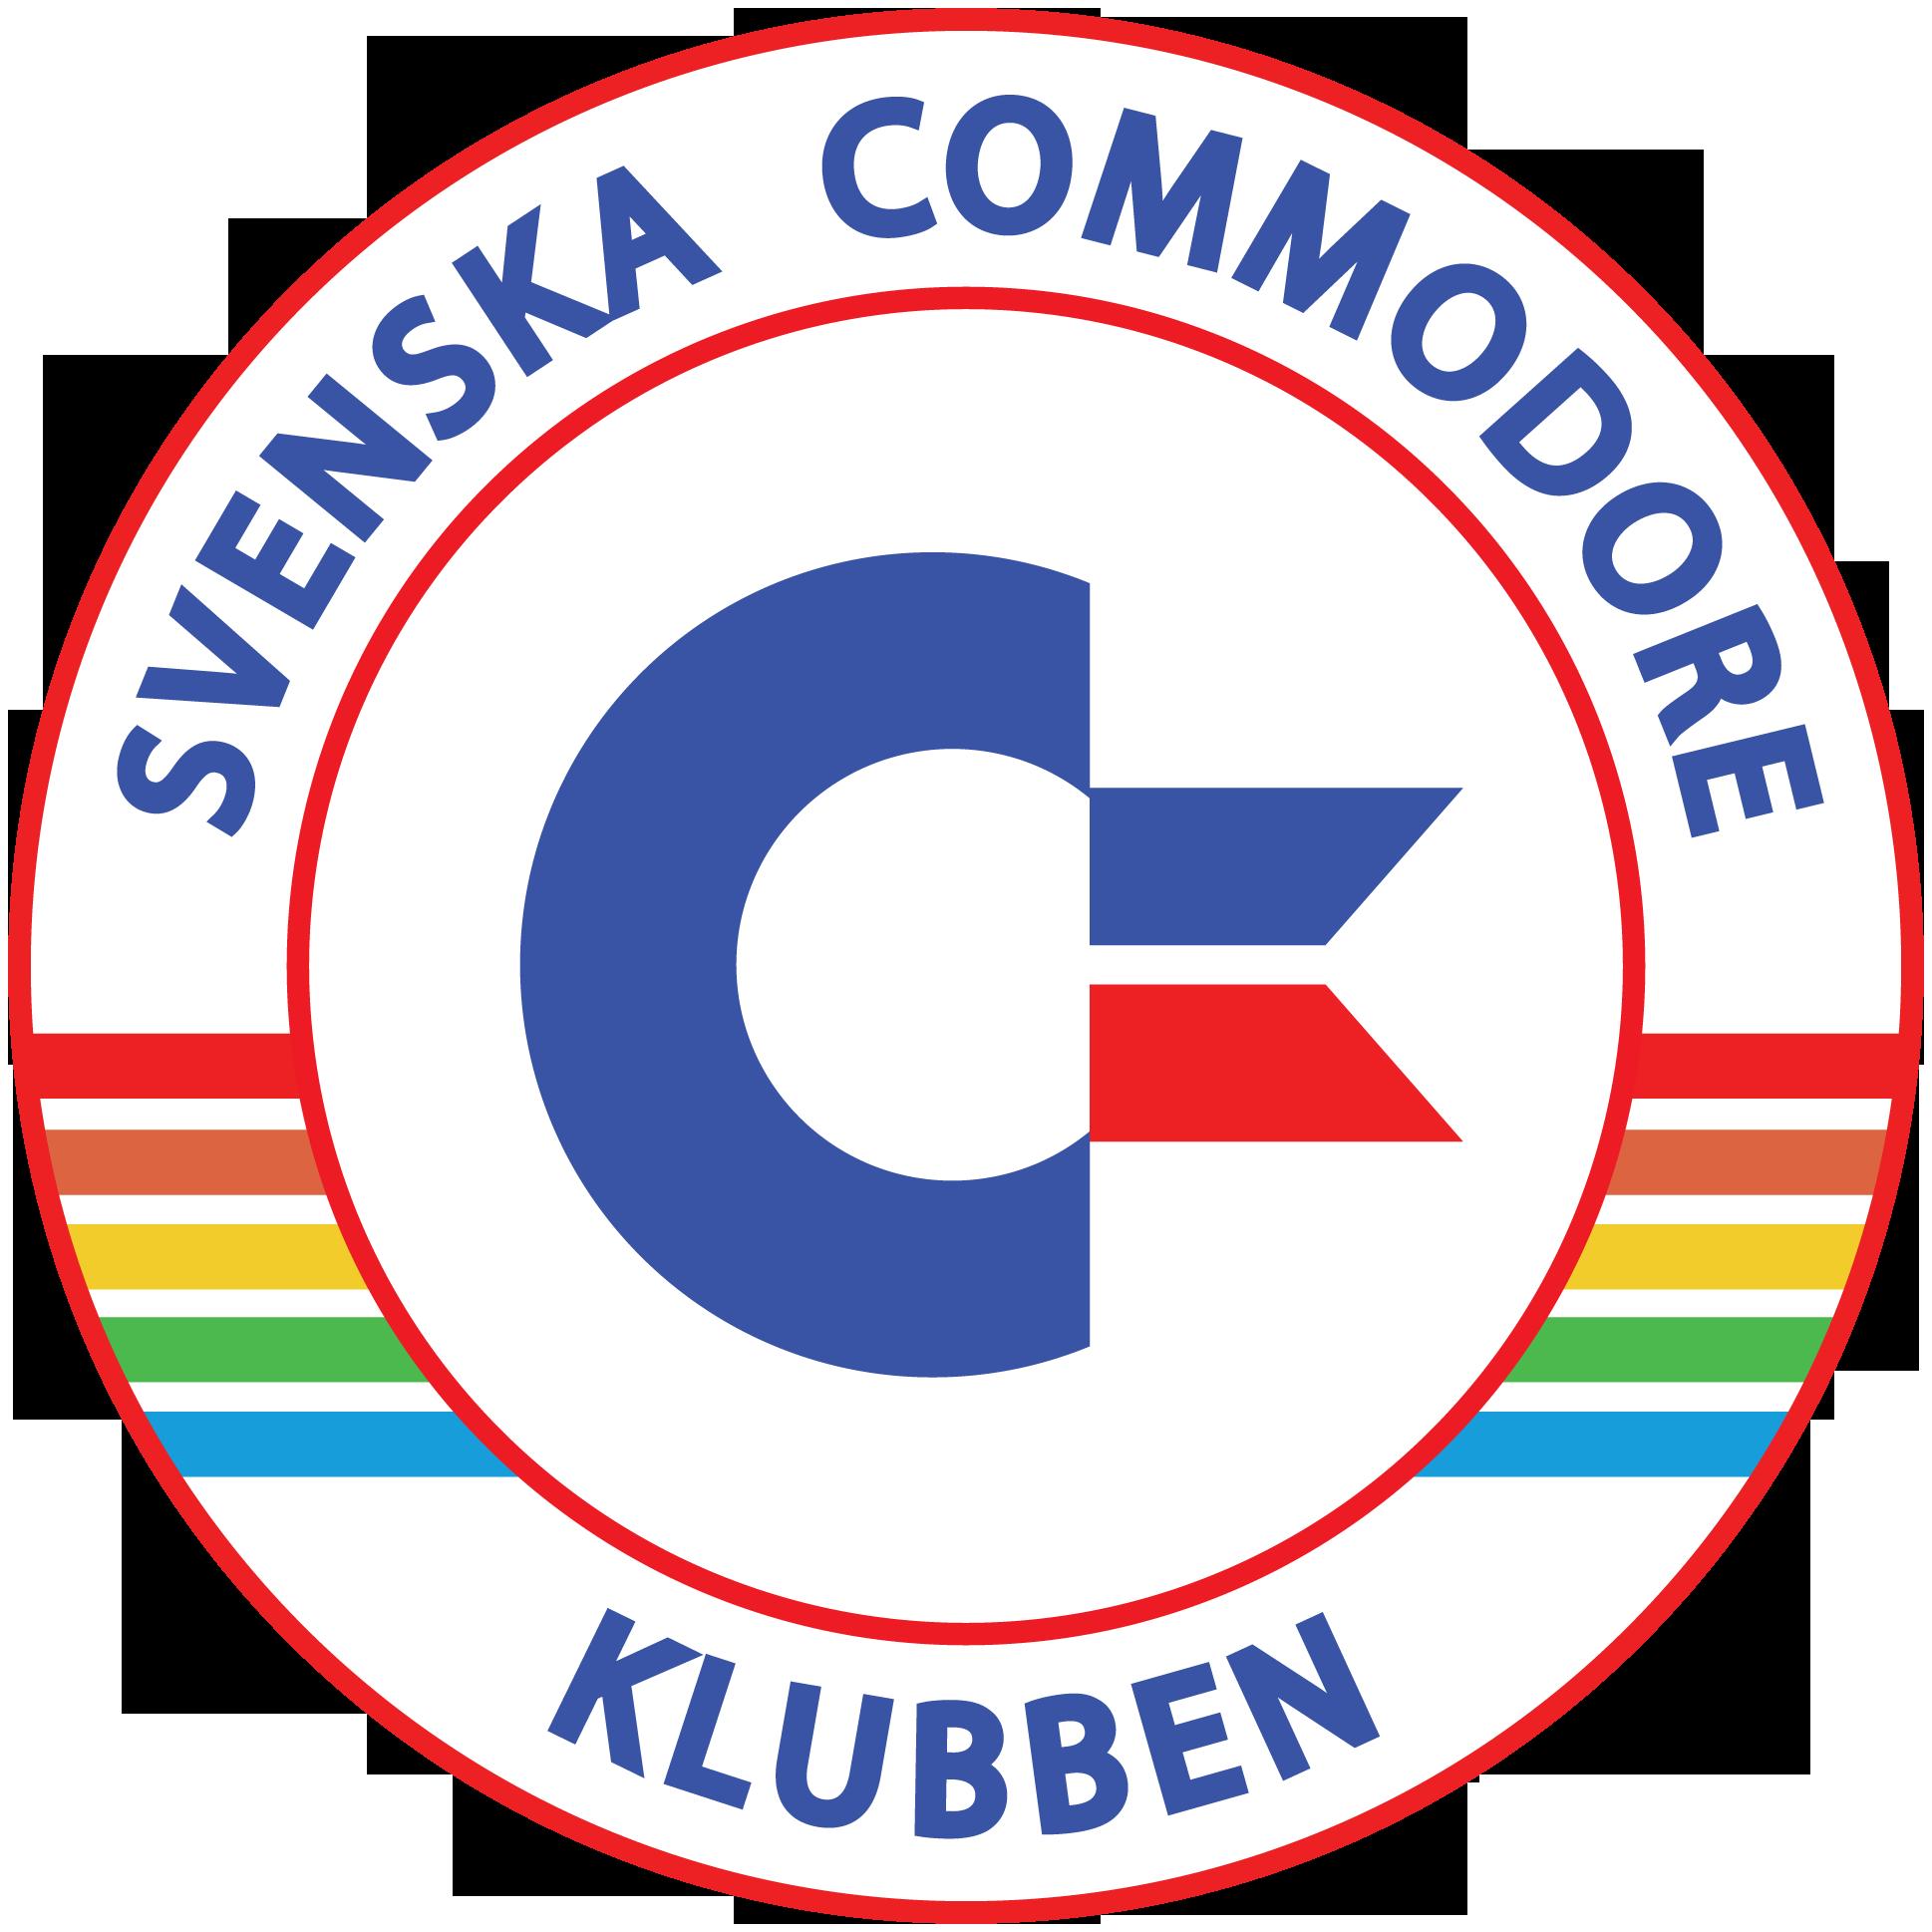 Svenska Commodoreklubben - SCK Logo